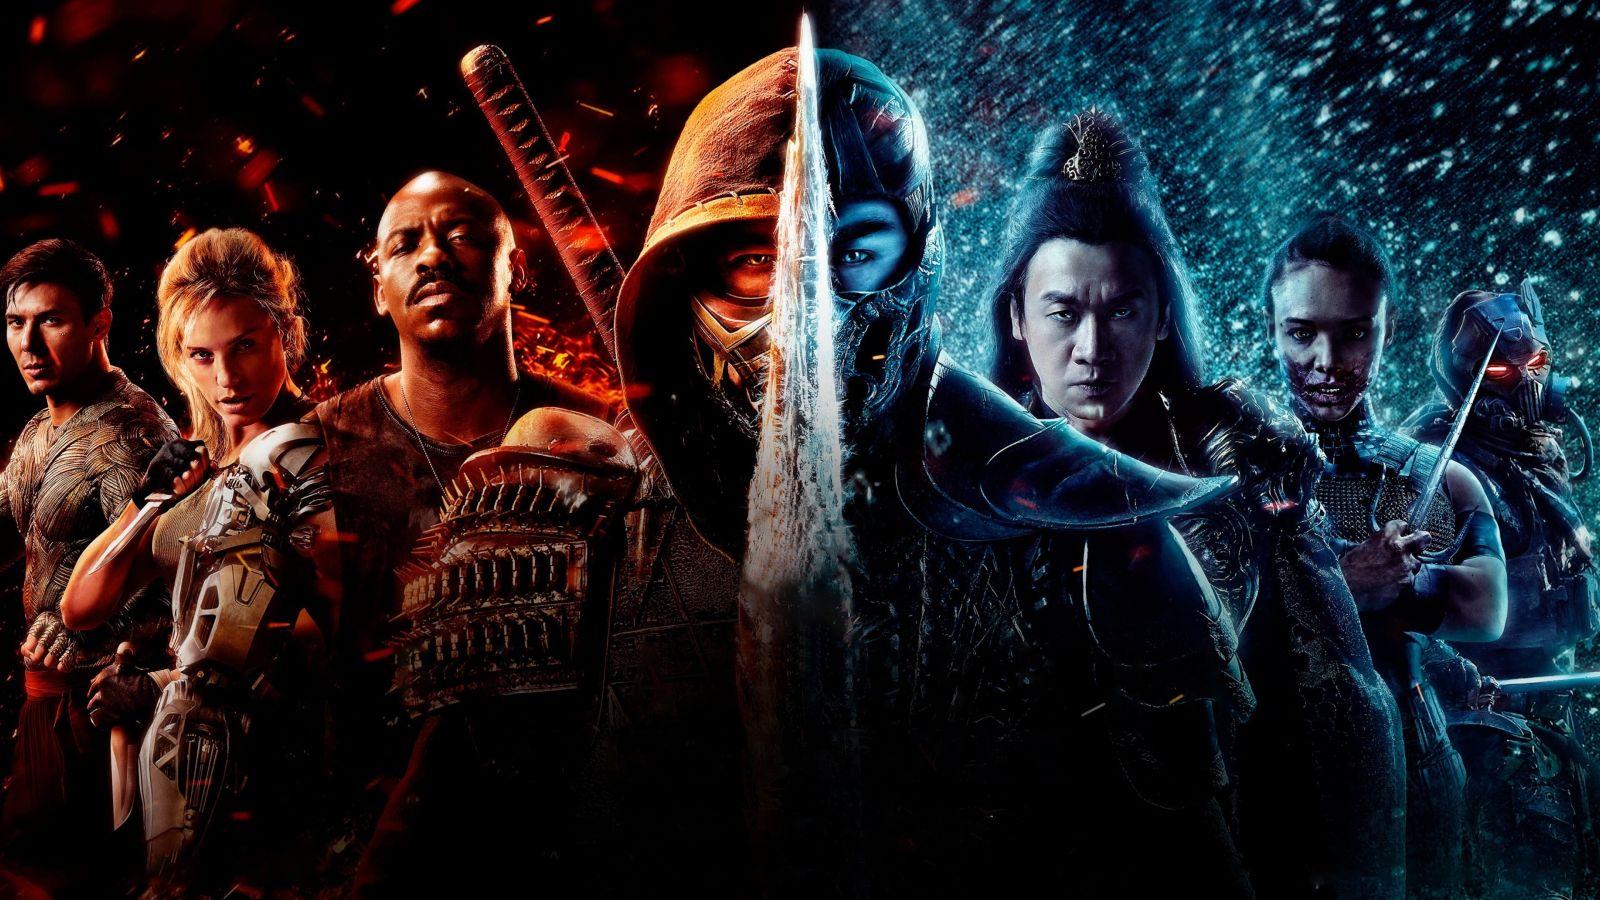 Watch Mortal Kombat (2021) Full Movies Full HD | Watch Free Online